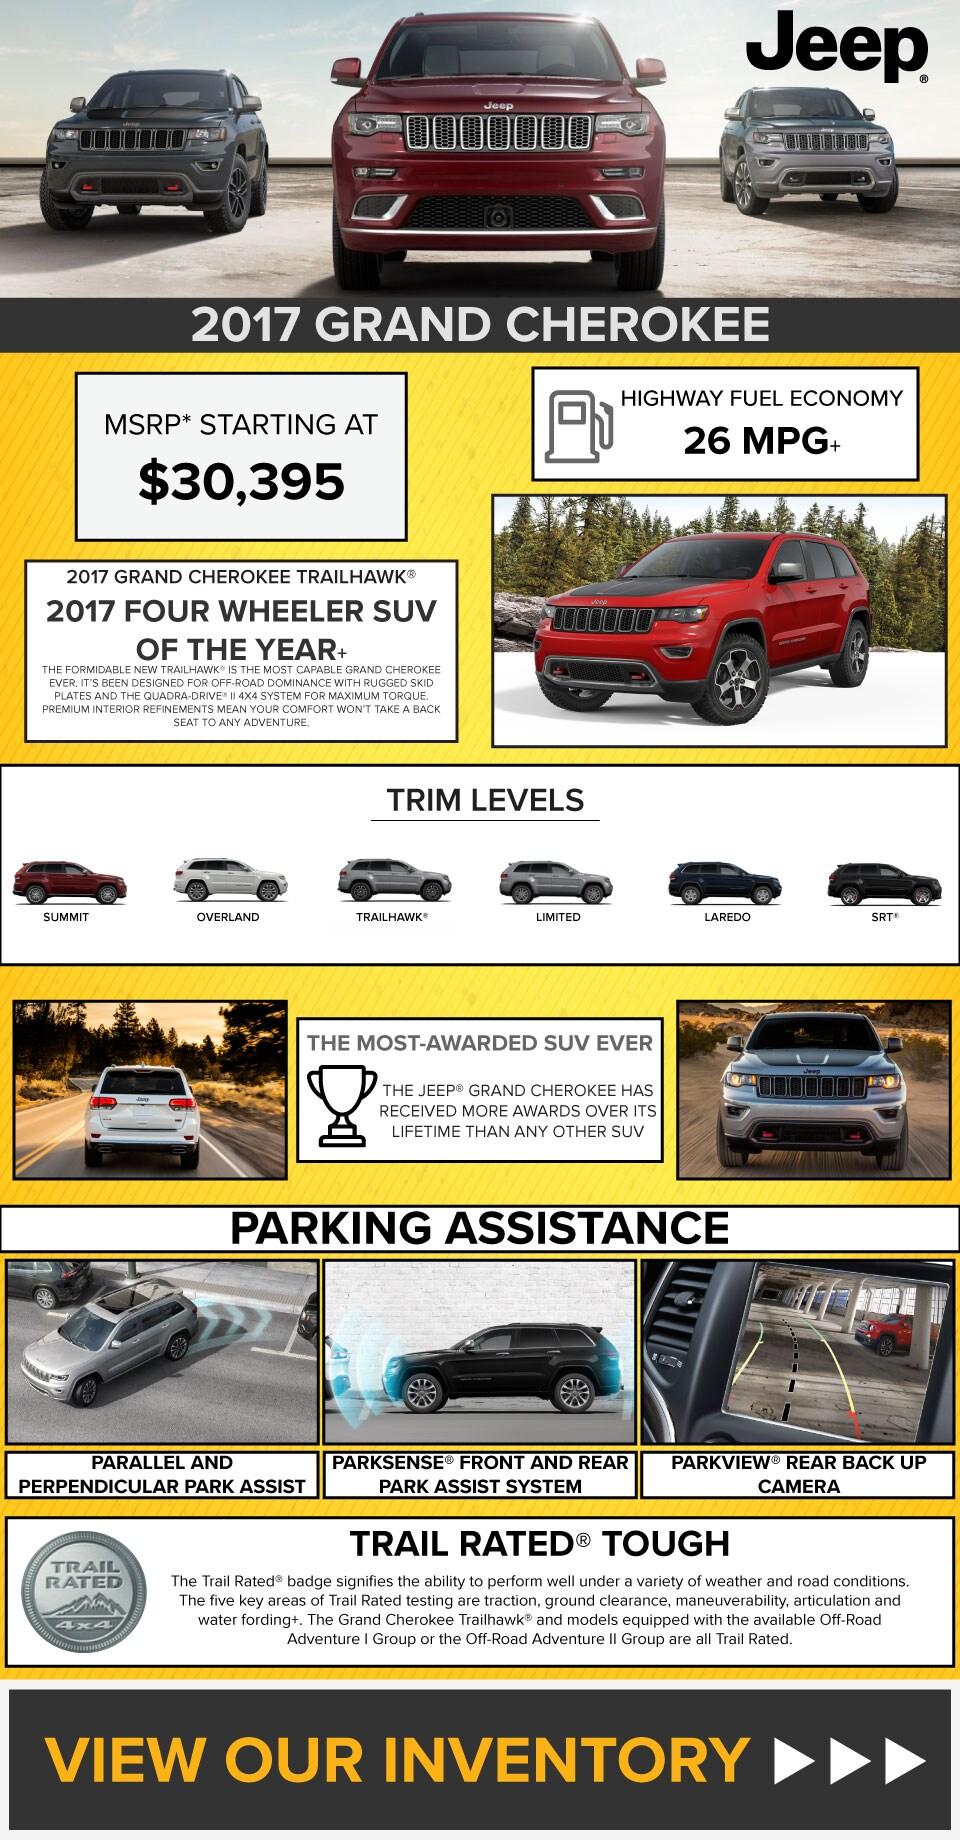 Quirk Chrysler Dodge FIAT Jeep Ram of Bangor | New Dodge, Jeep, FIAT